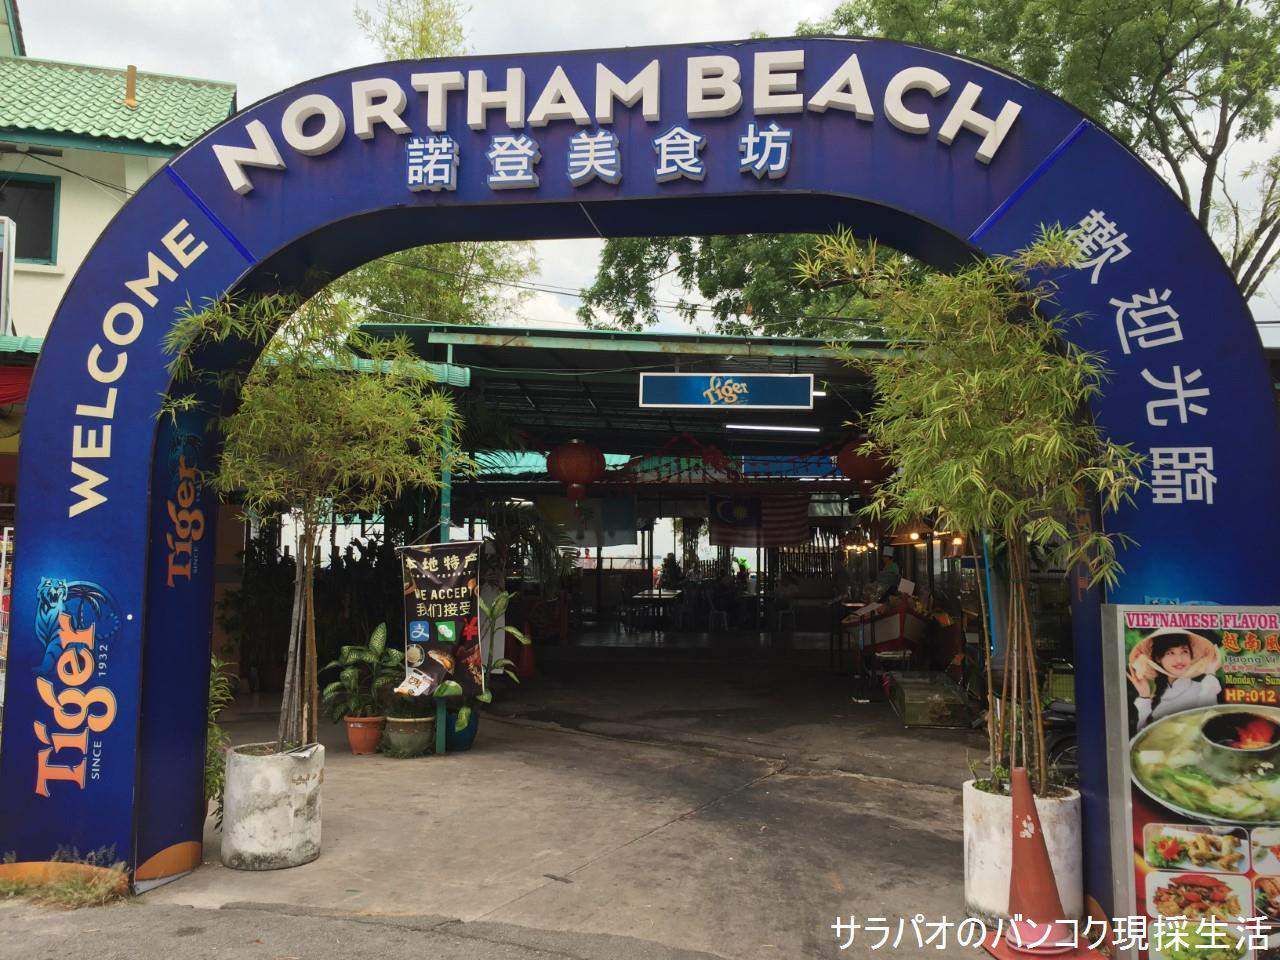 NorthamBeach_01.jpg